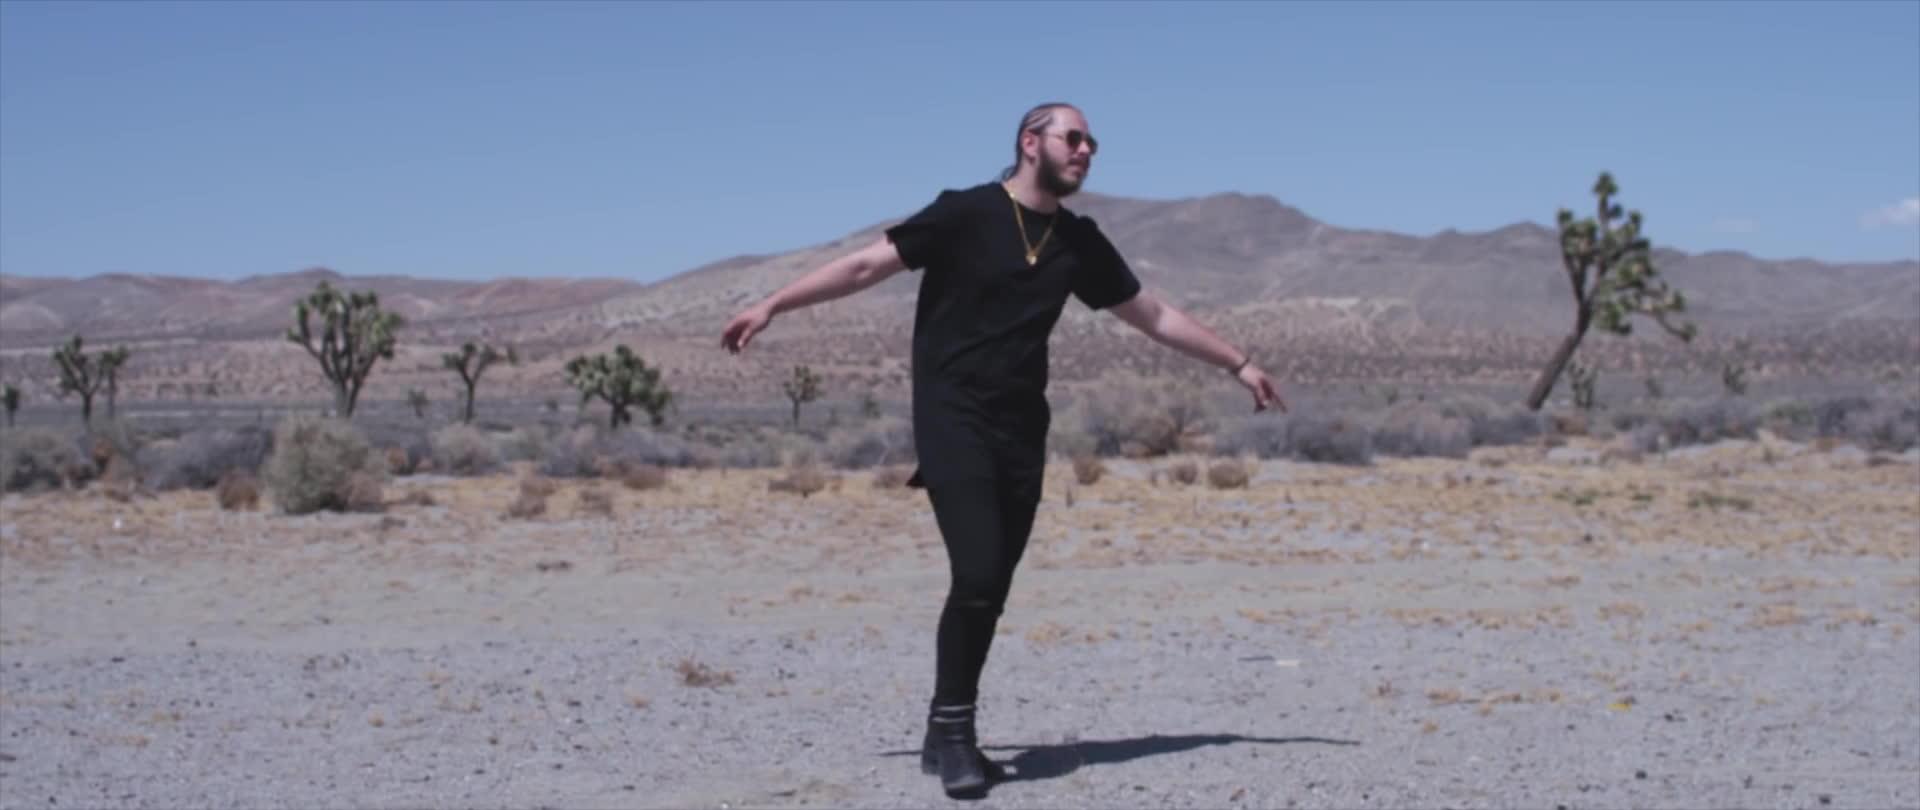 post malone, white iverson, white iverson music video, white iverson official, Post Malone - White Iverson GIFs